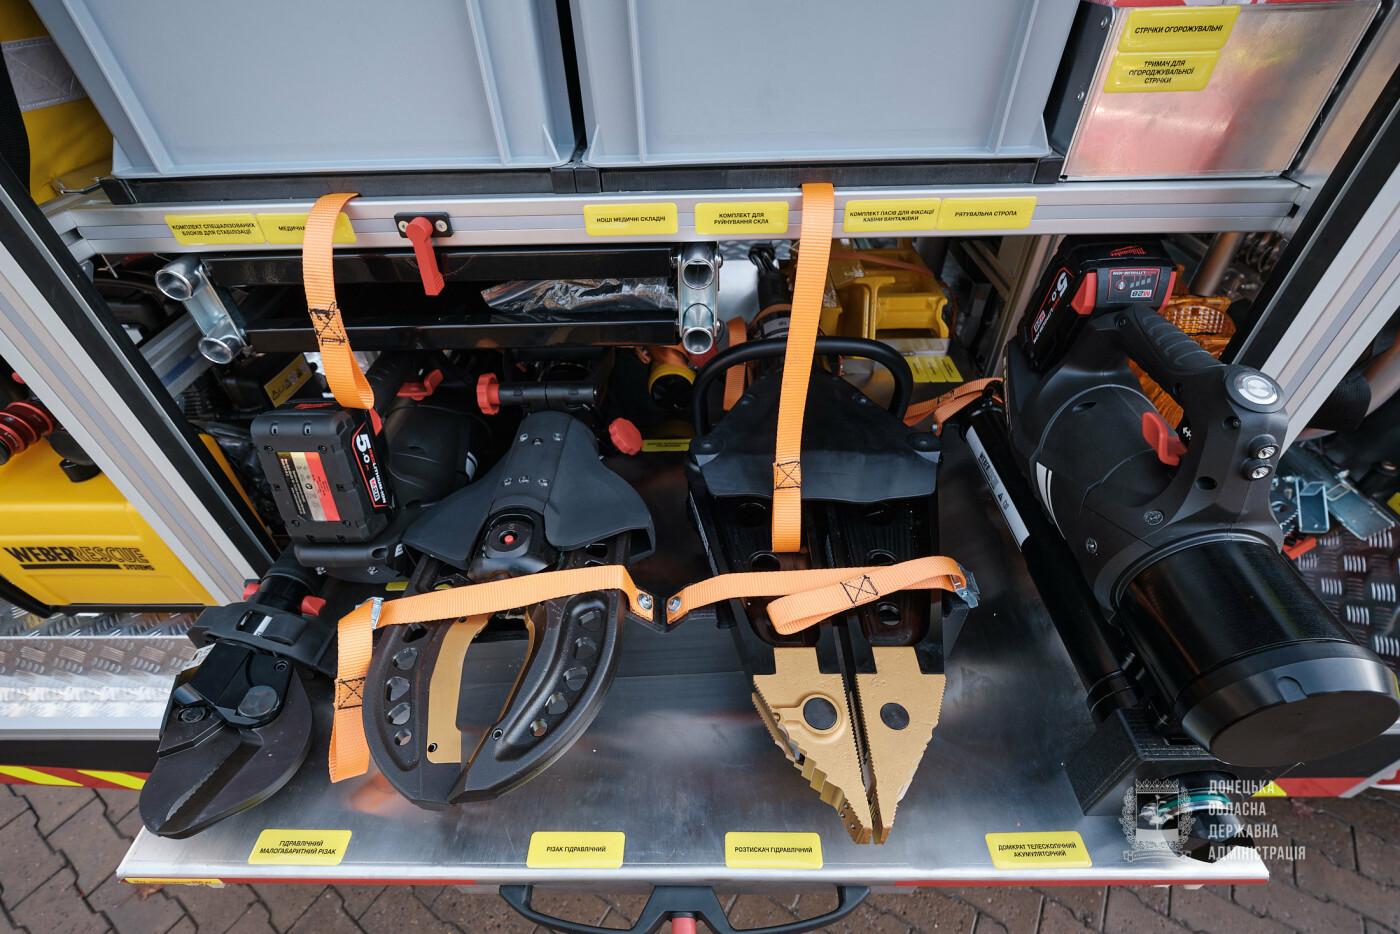 Слов'янські рятувальники отримали нову пожежну автоцистерну, фото-18